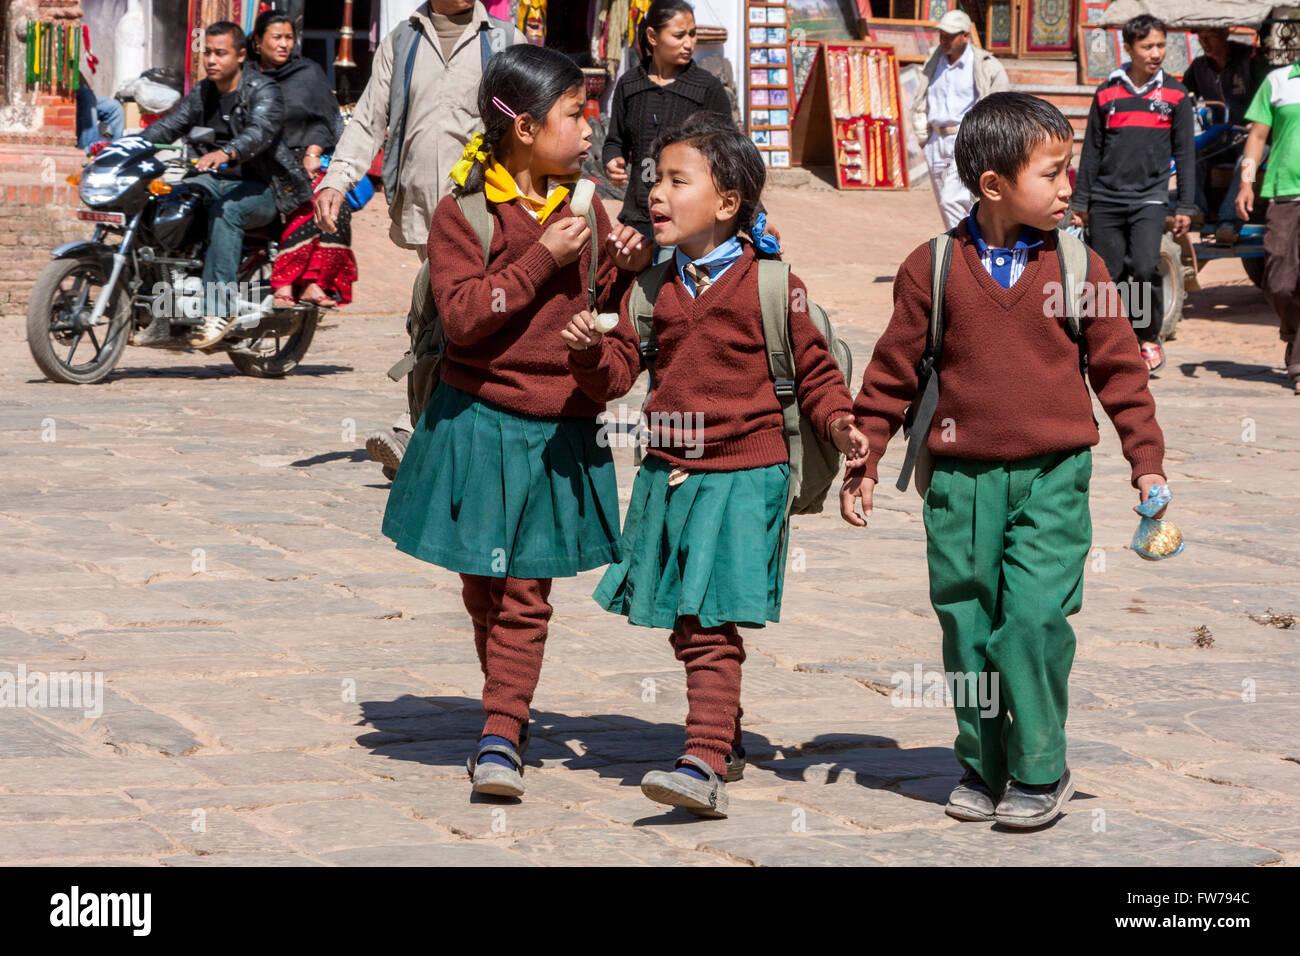 Bhaktapur, Nepal.  Young Nepali Schoolchildren in School Uniforms. - Stock Image